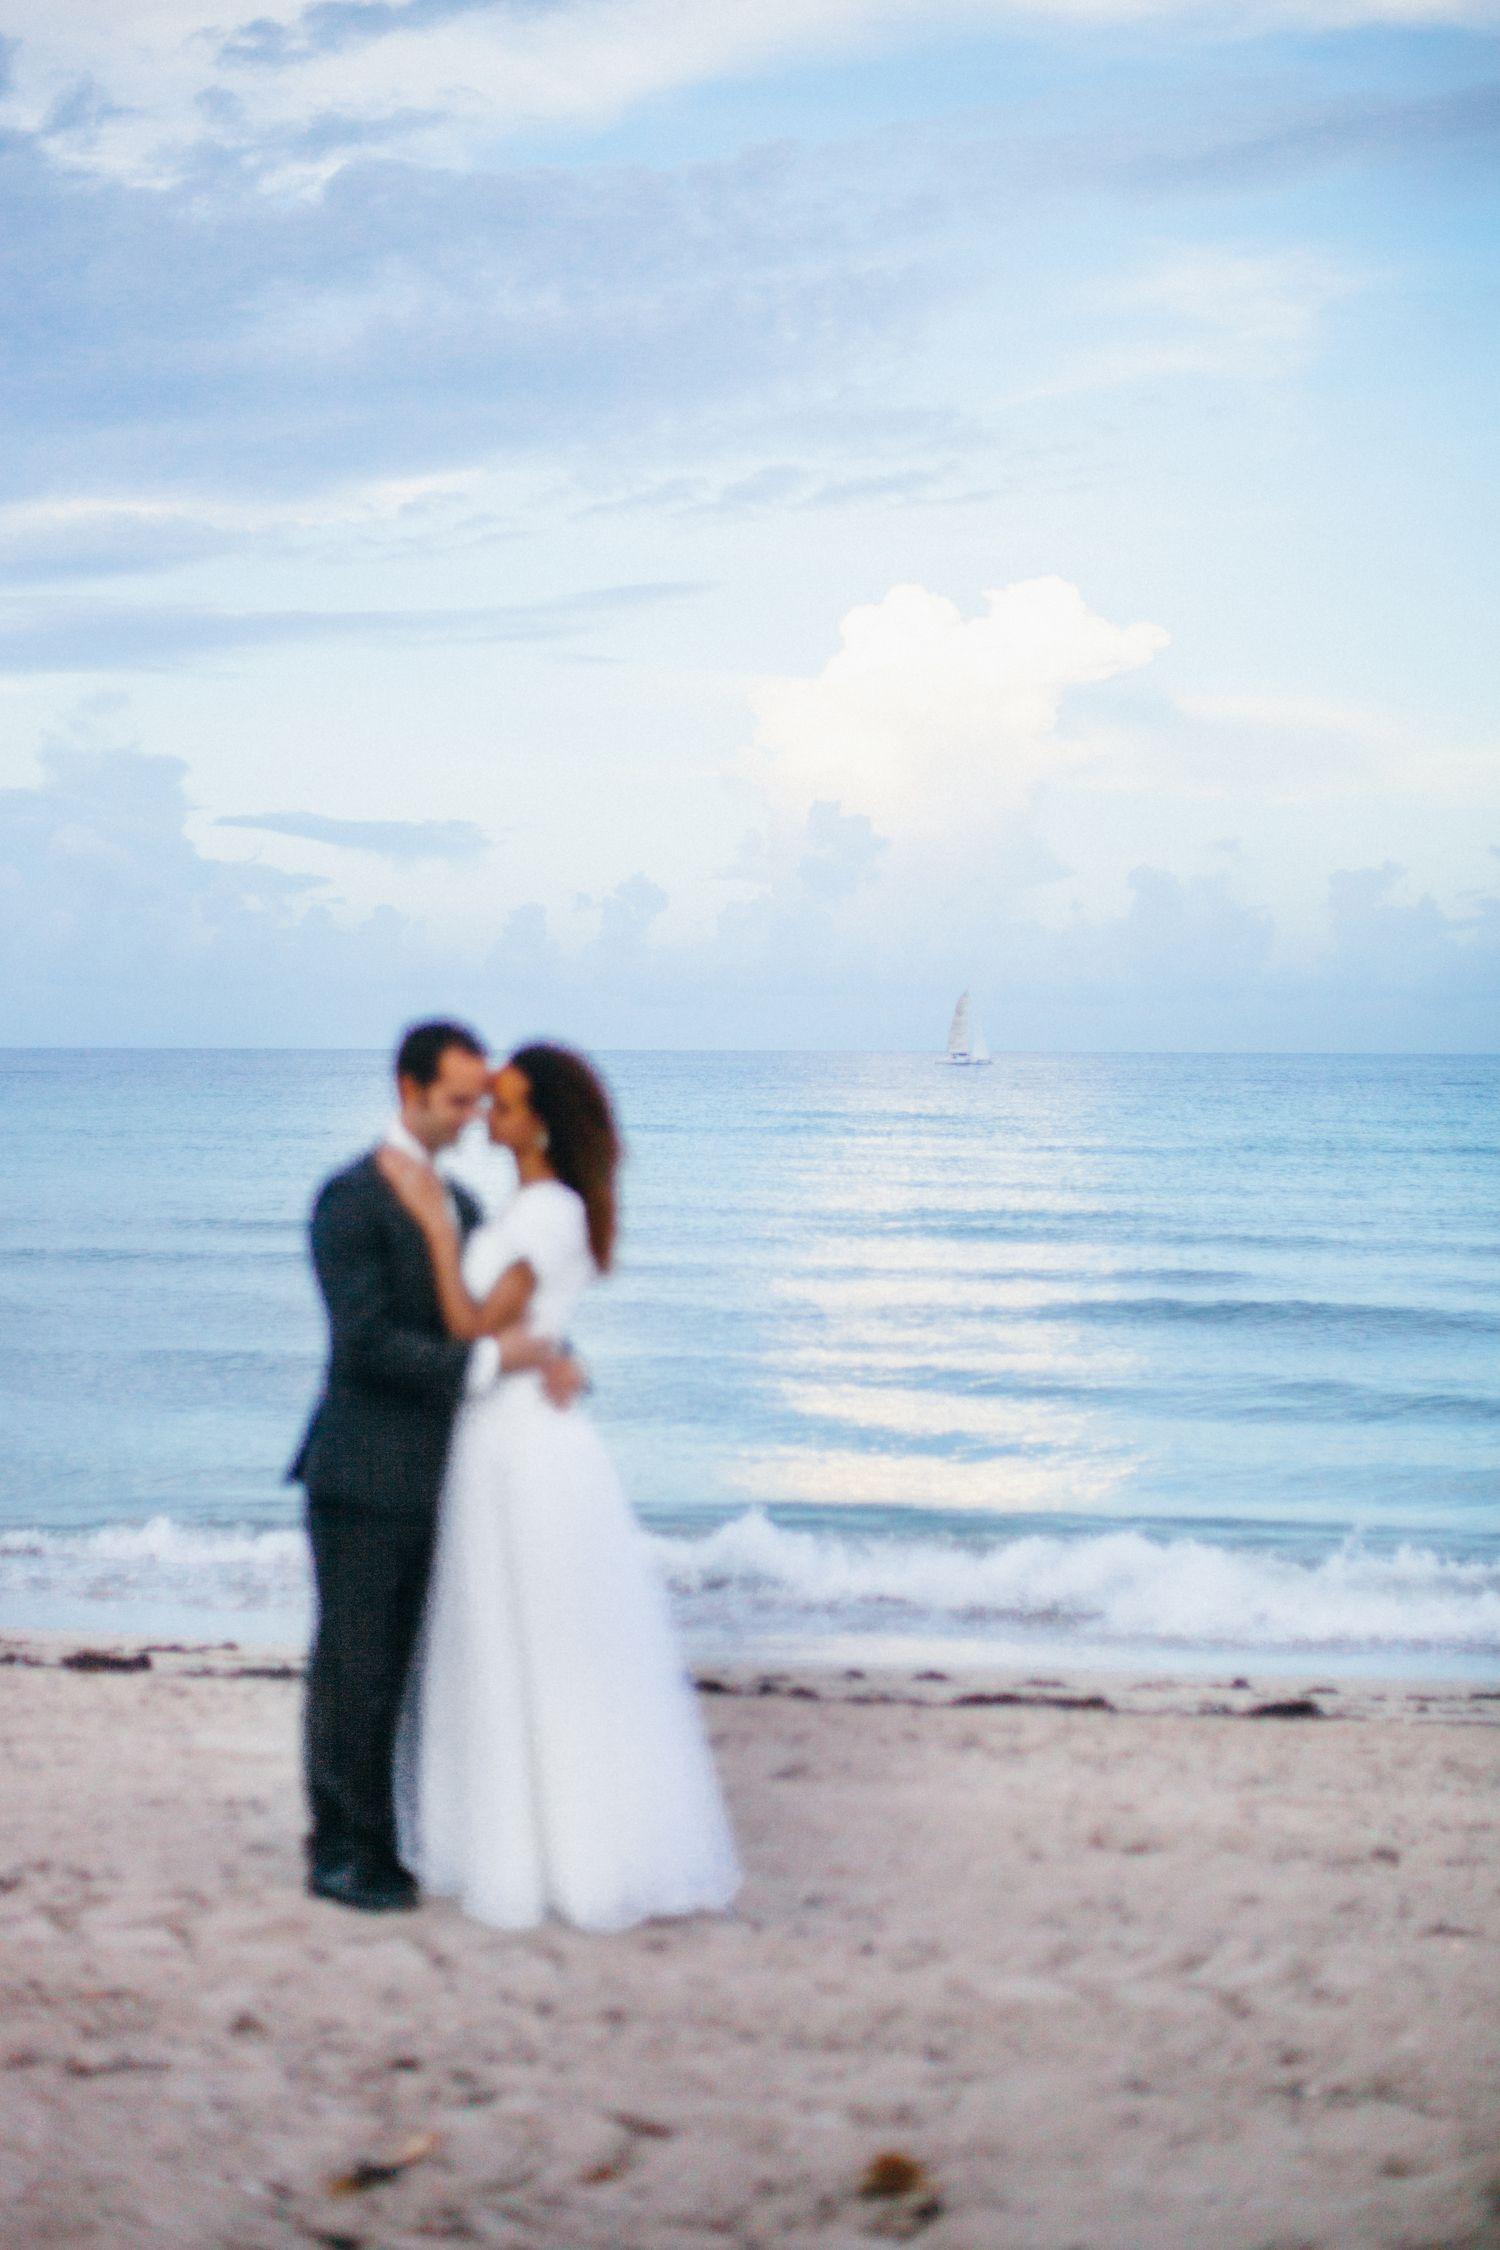 Alee Gleiberman Photography - South Florida / Miami Wedding Photographer -Engagement Photographer -Engagement Photography -Miami Engagement Photographer - Miami Wedding - beach wedding